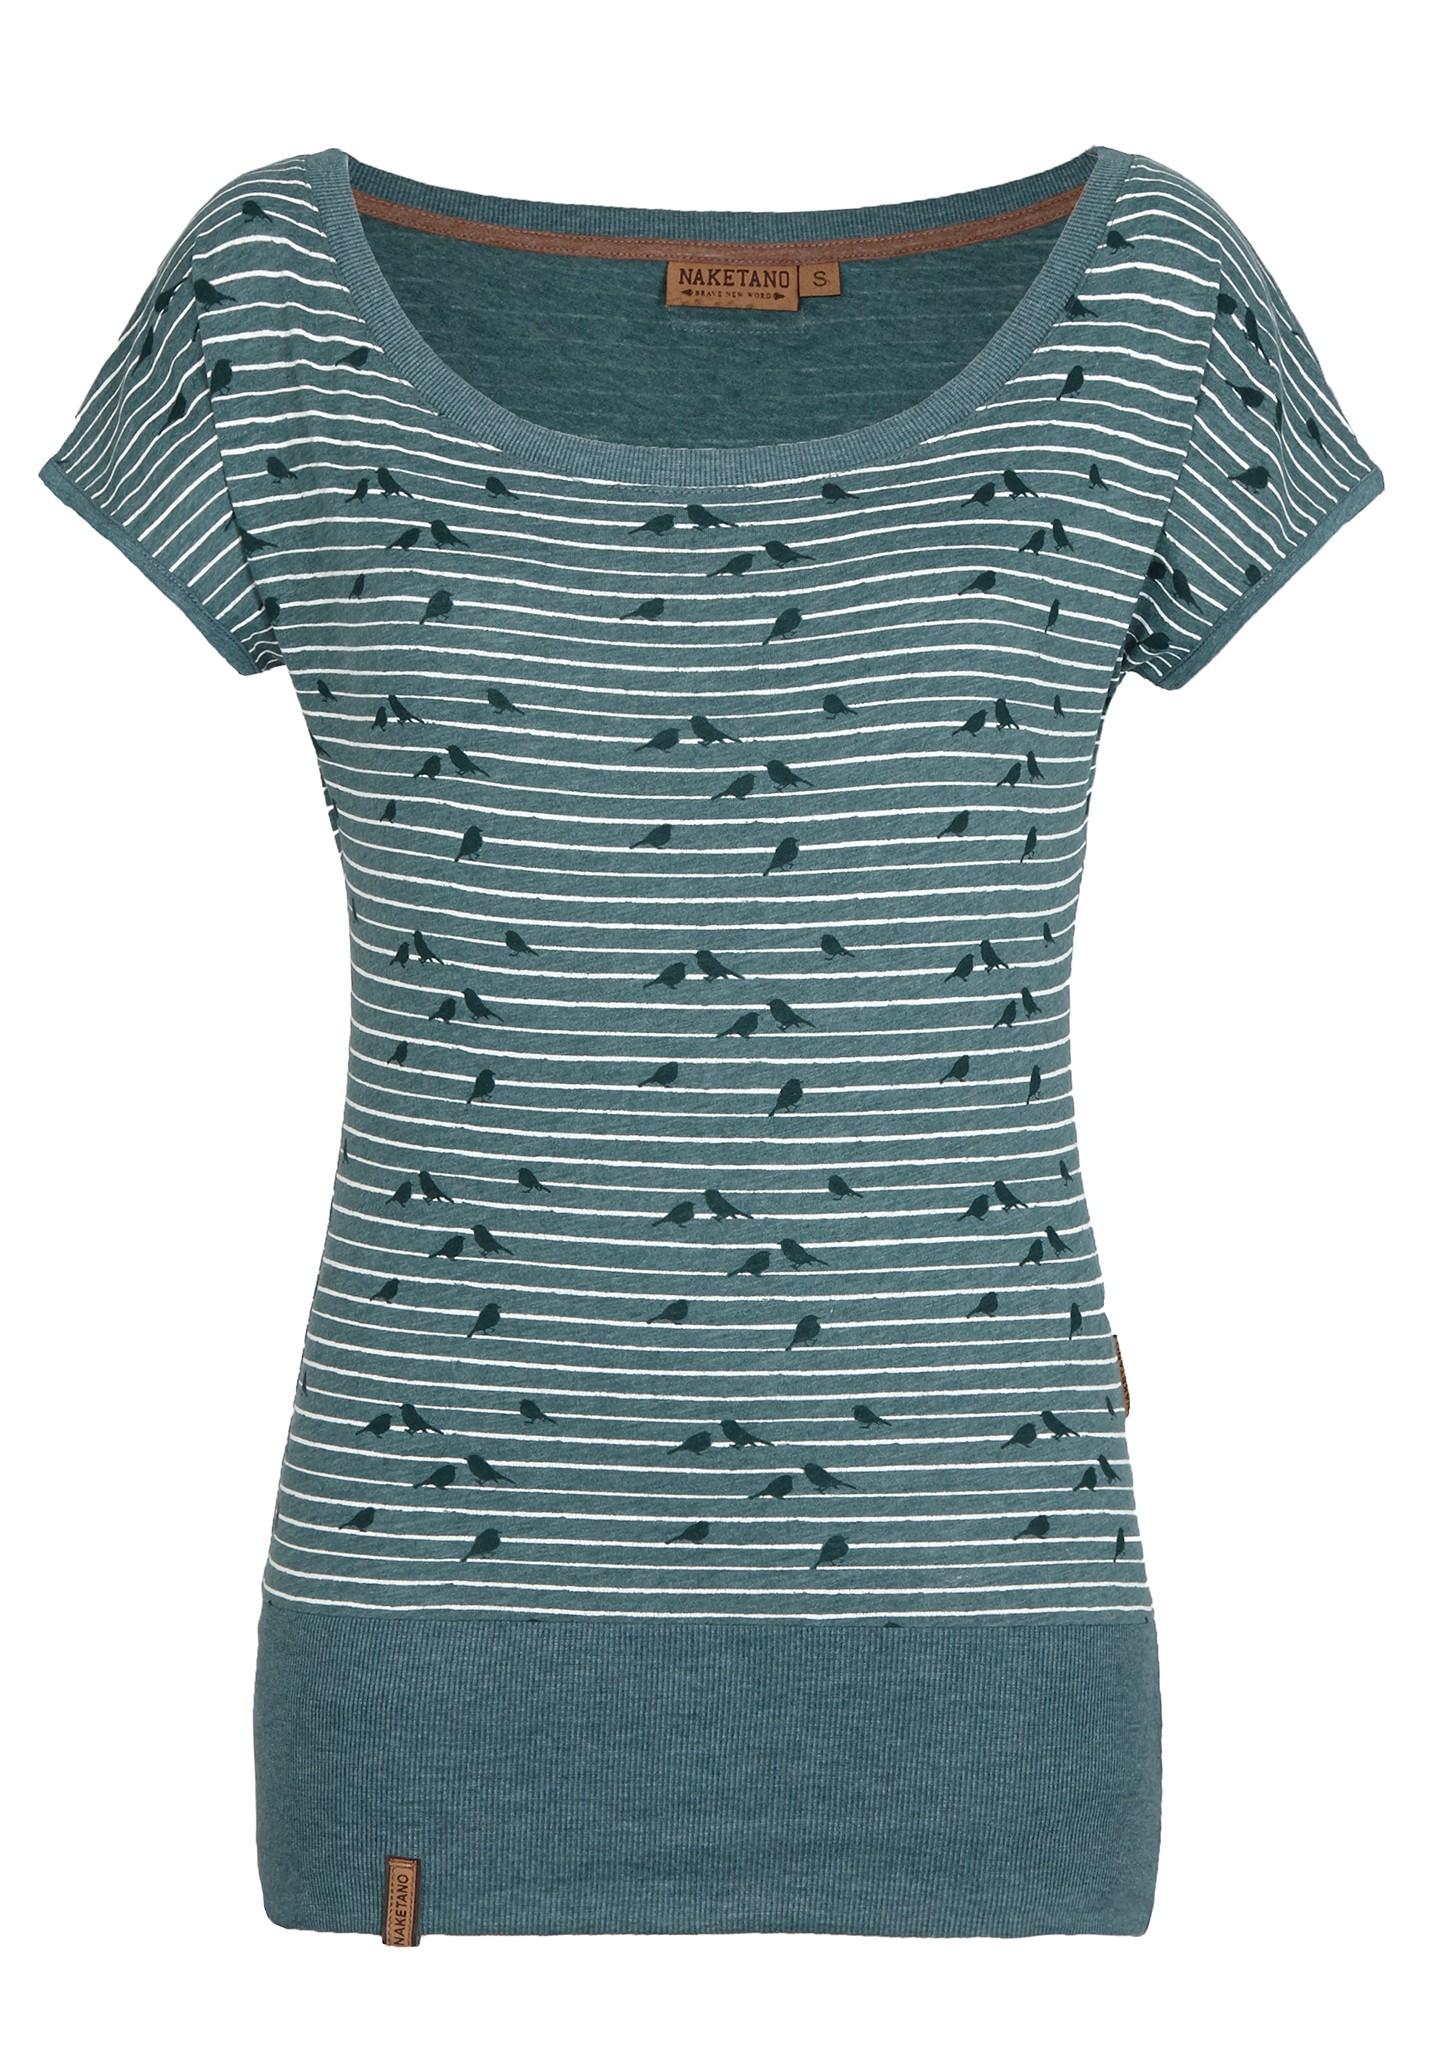 details zu neu naketano wolle spatzl damen t shirt shirt. Black Bedroom Furniture Sets. Home Design Ideas